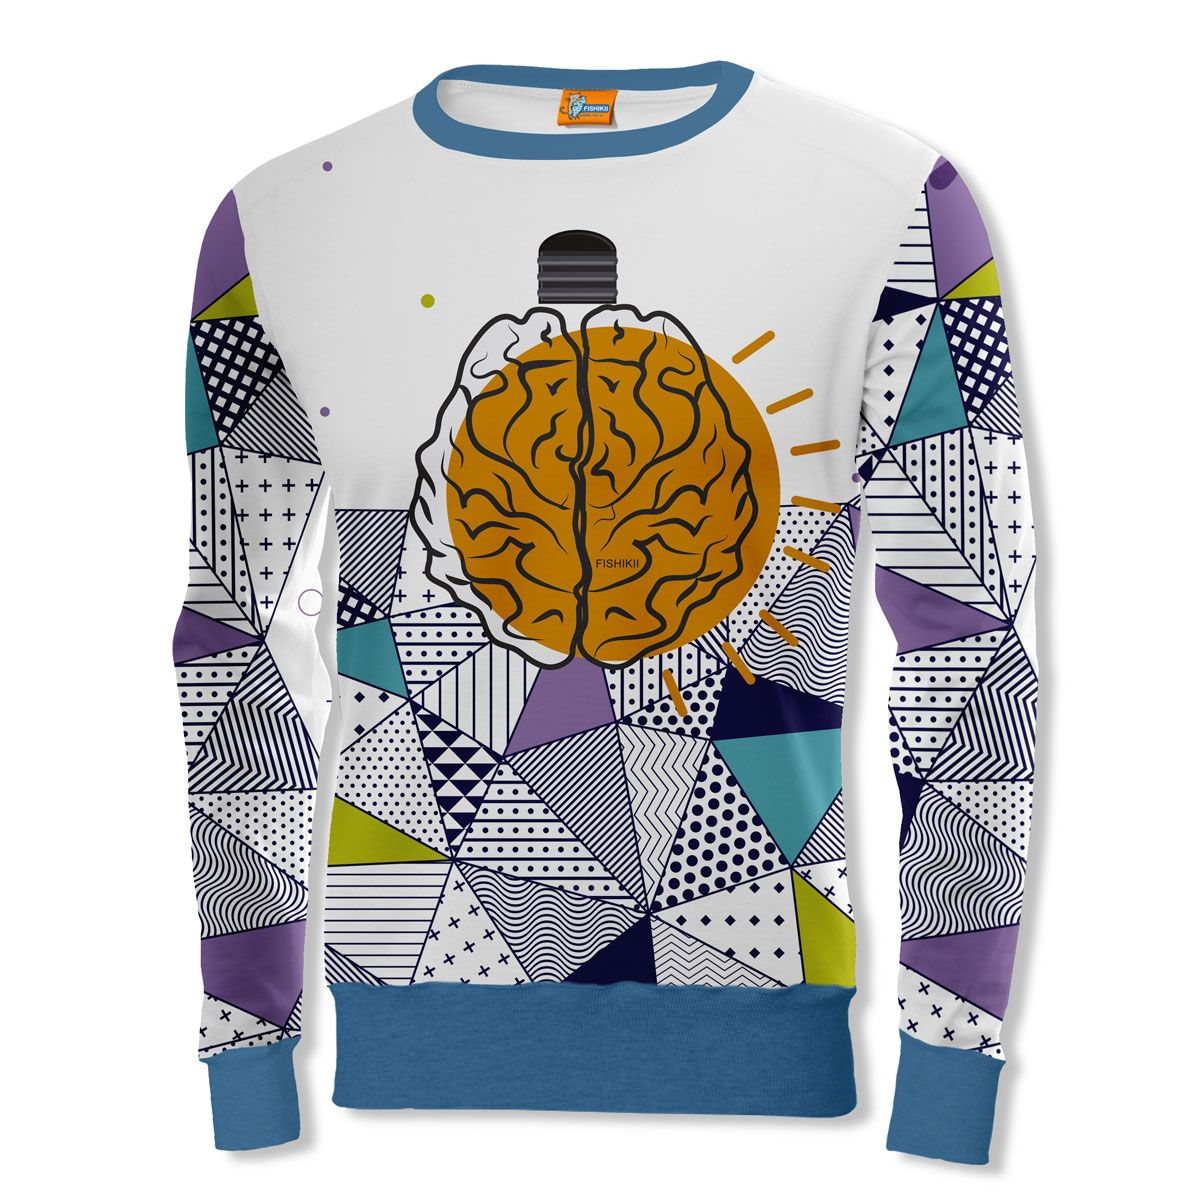 Idea Sweatshirt Fun sweatshirts, Sweatshirts, Sweatshirt